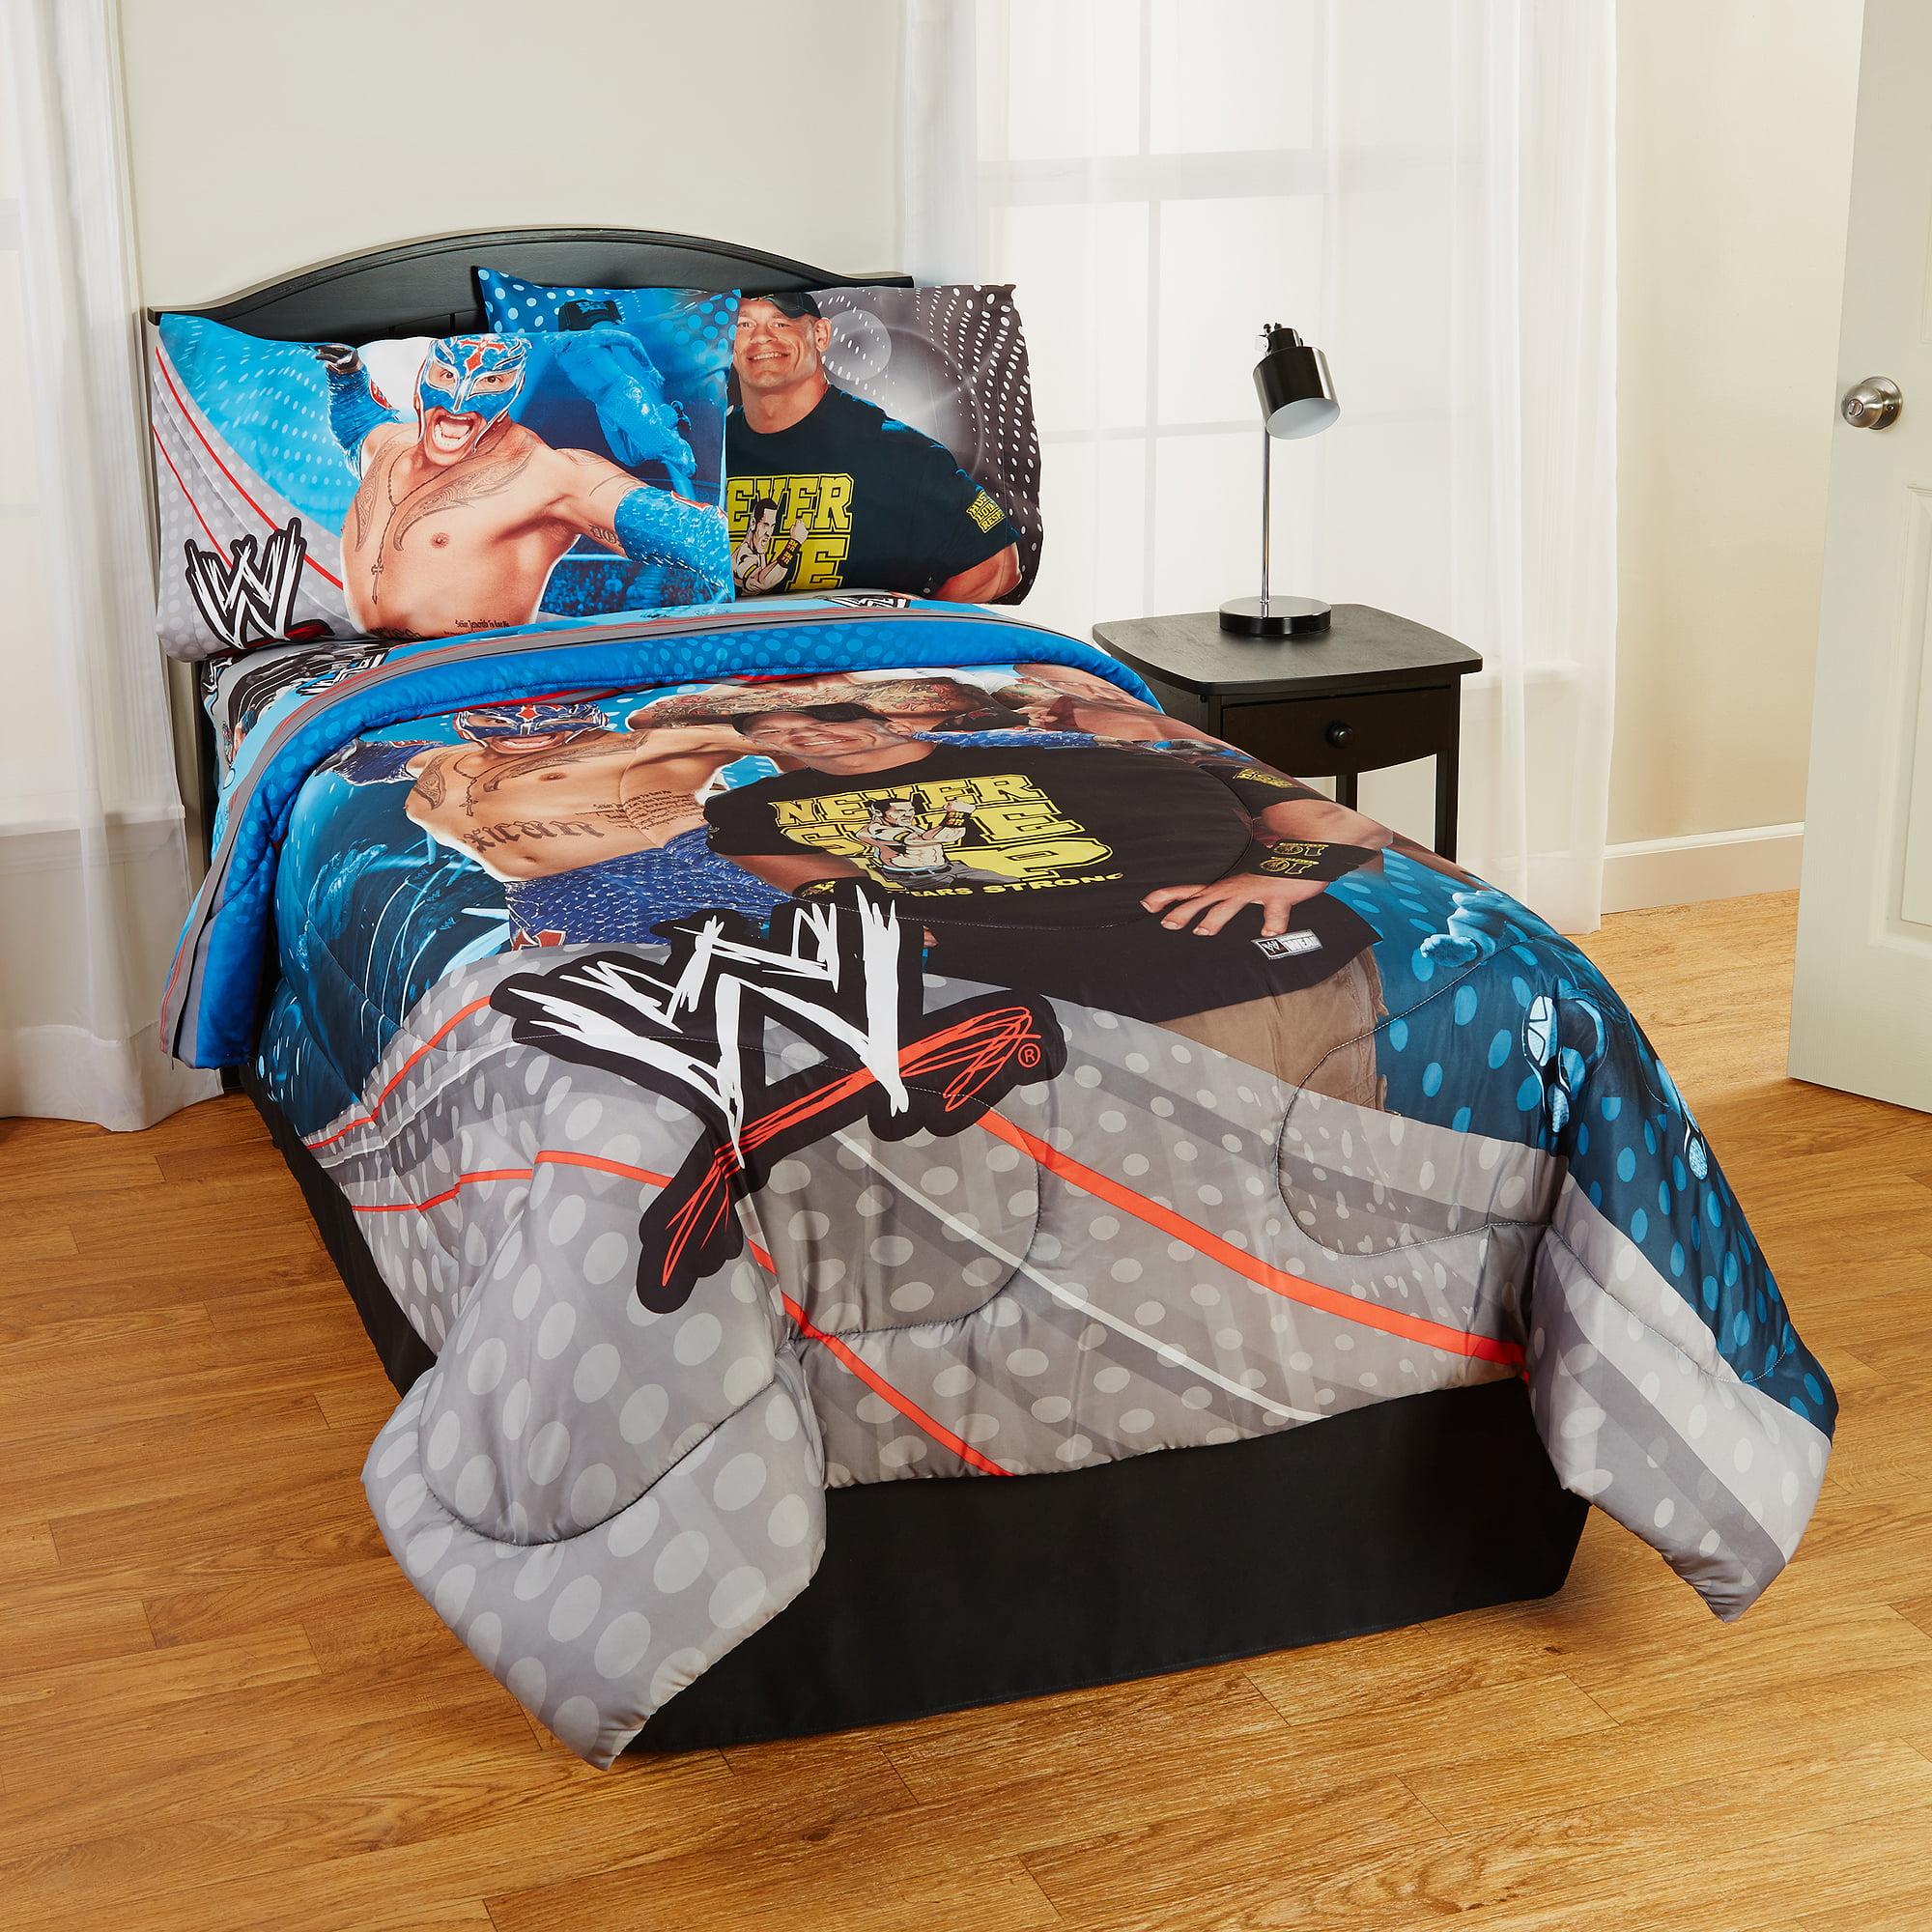 . WWE  Showdown  Reversible Comforter   Walmart com